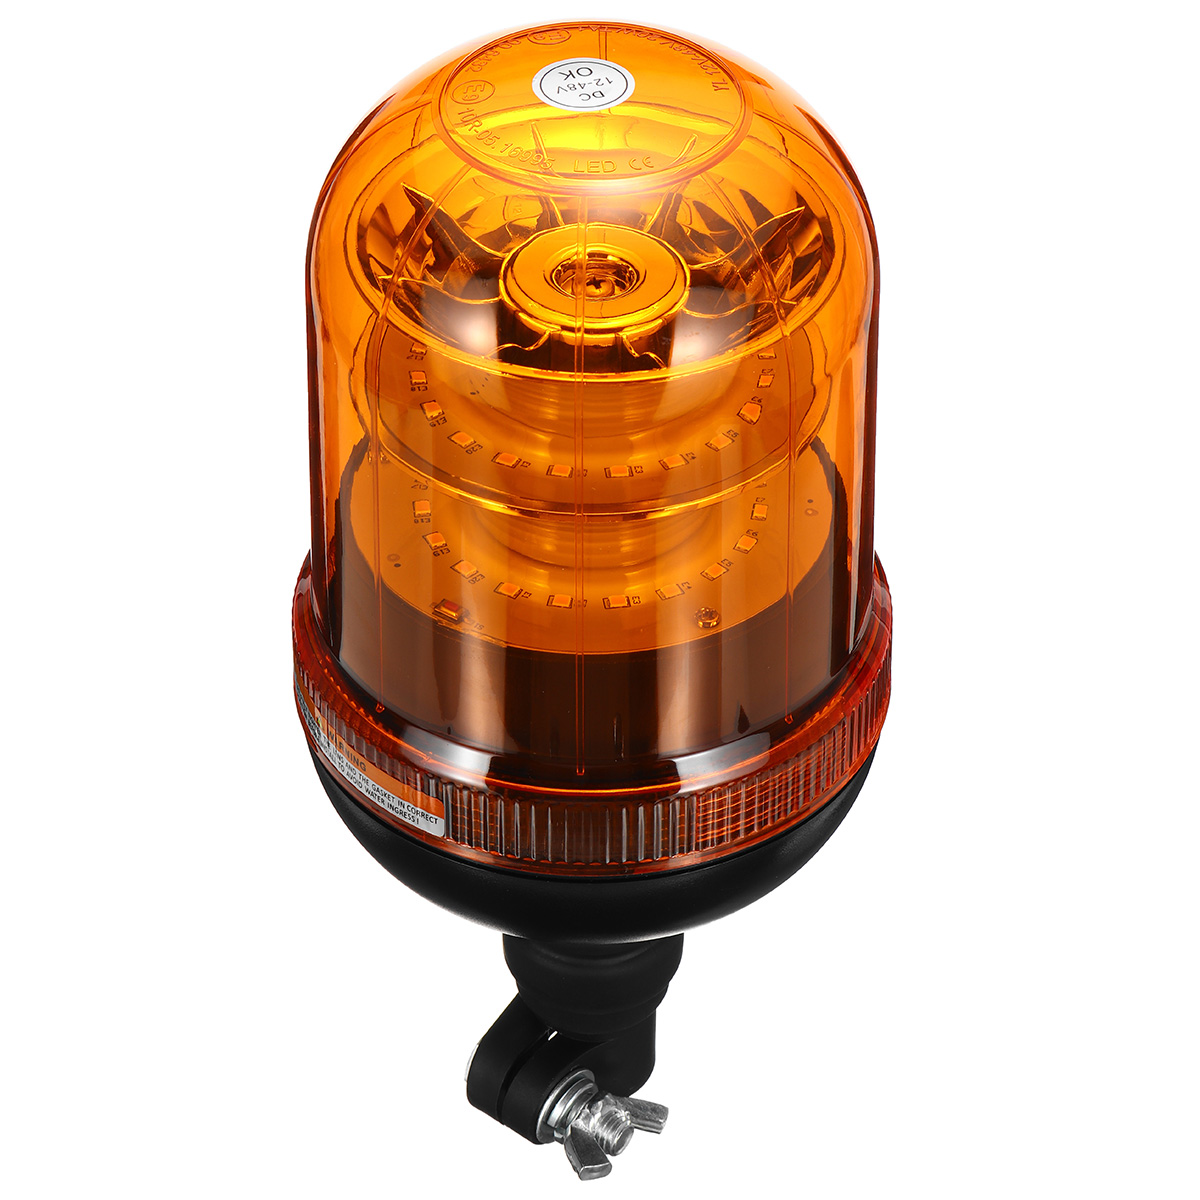 40LED Warning Light 12-24V 4 Flashing Modes Beacon Flexible Din Pole Mount Tractor Warning Light